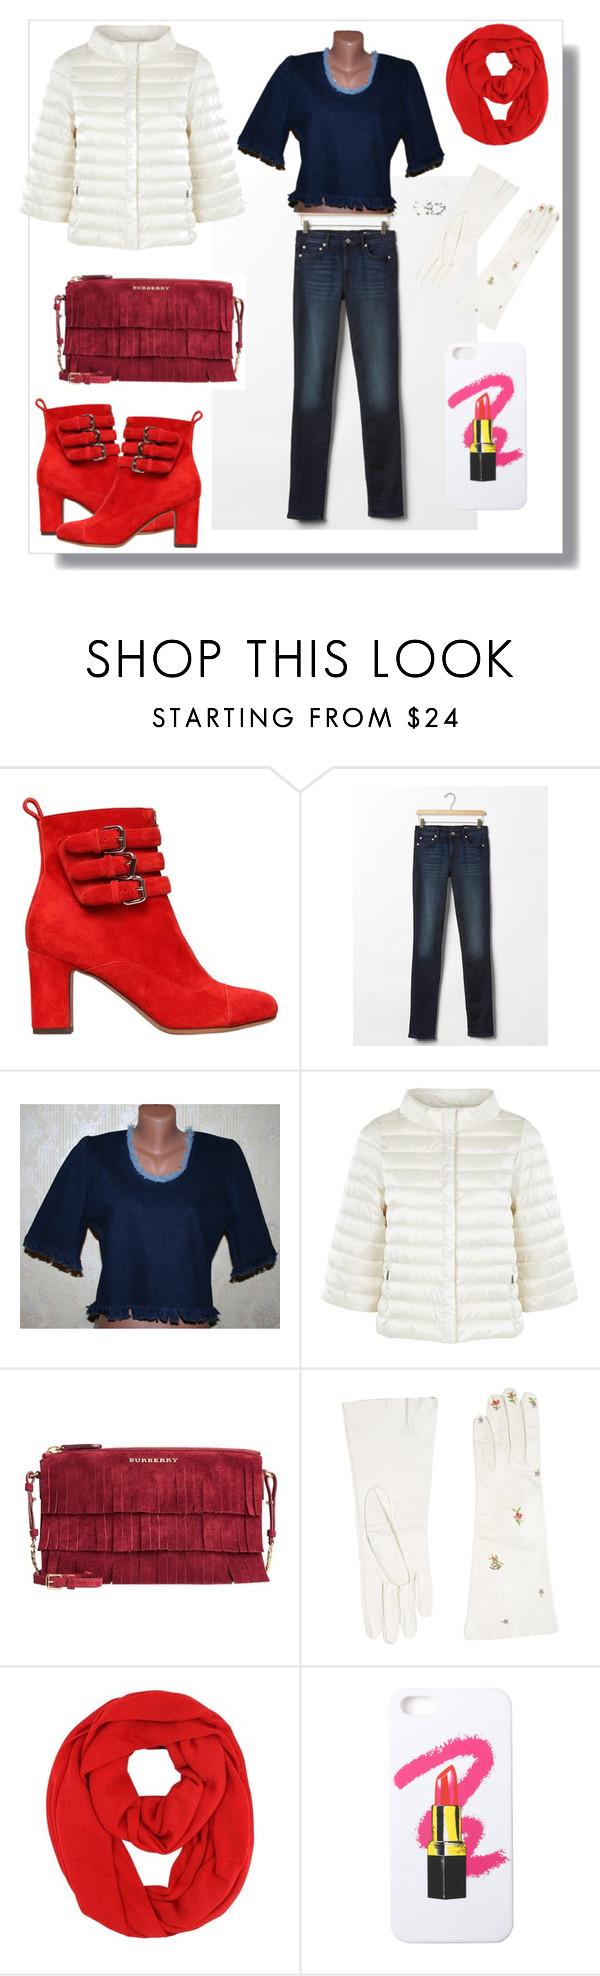 """Fashion Bureau"" by elena-kononenko ❤ liked on Polyvore featuring Tabitha Simmons, Gap, Weekend Max Mara, Burberry, Dsquared2, LAUREN MOSHI, women's clothing, women, female and woman"